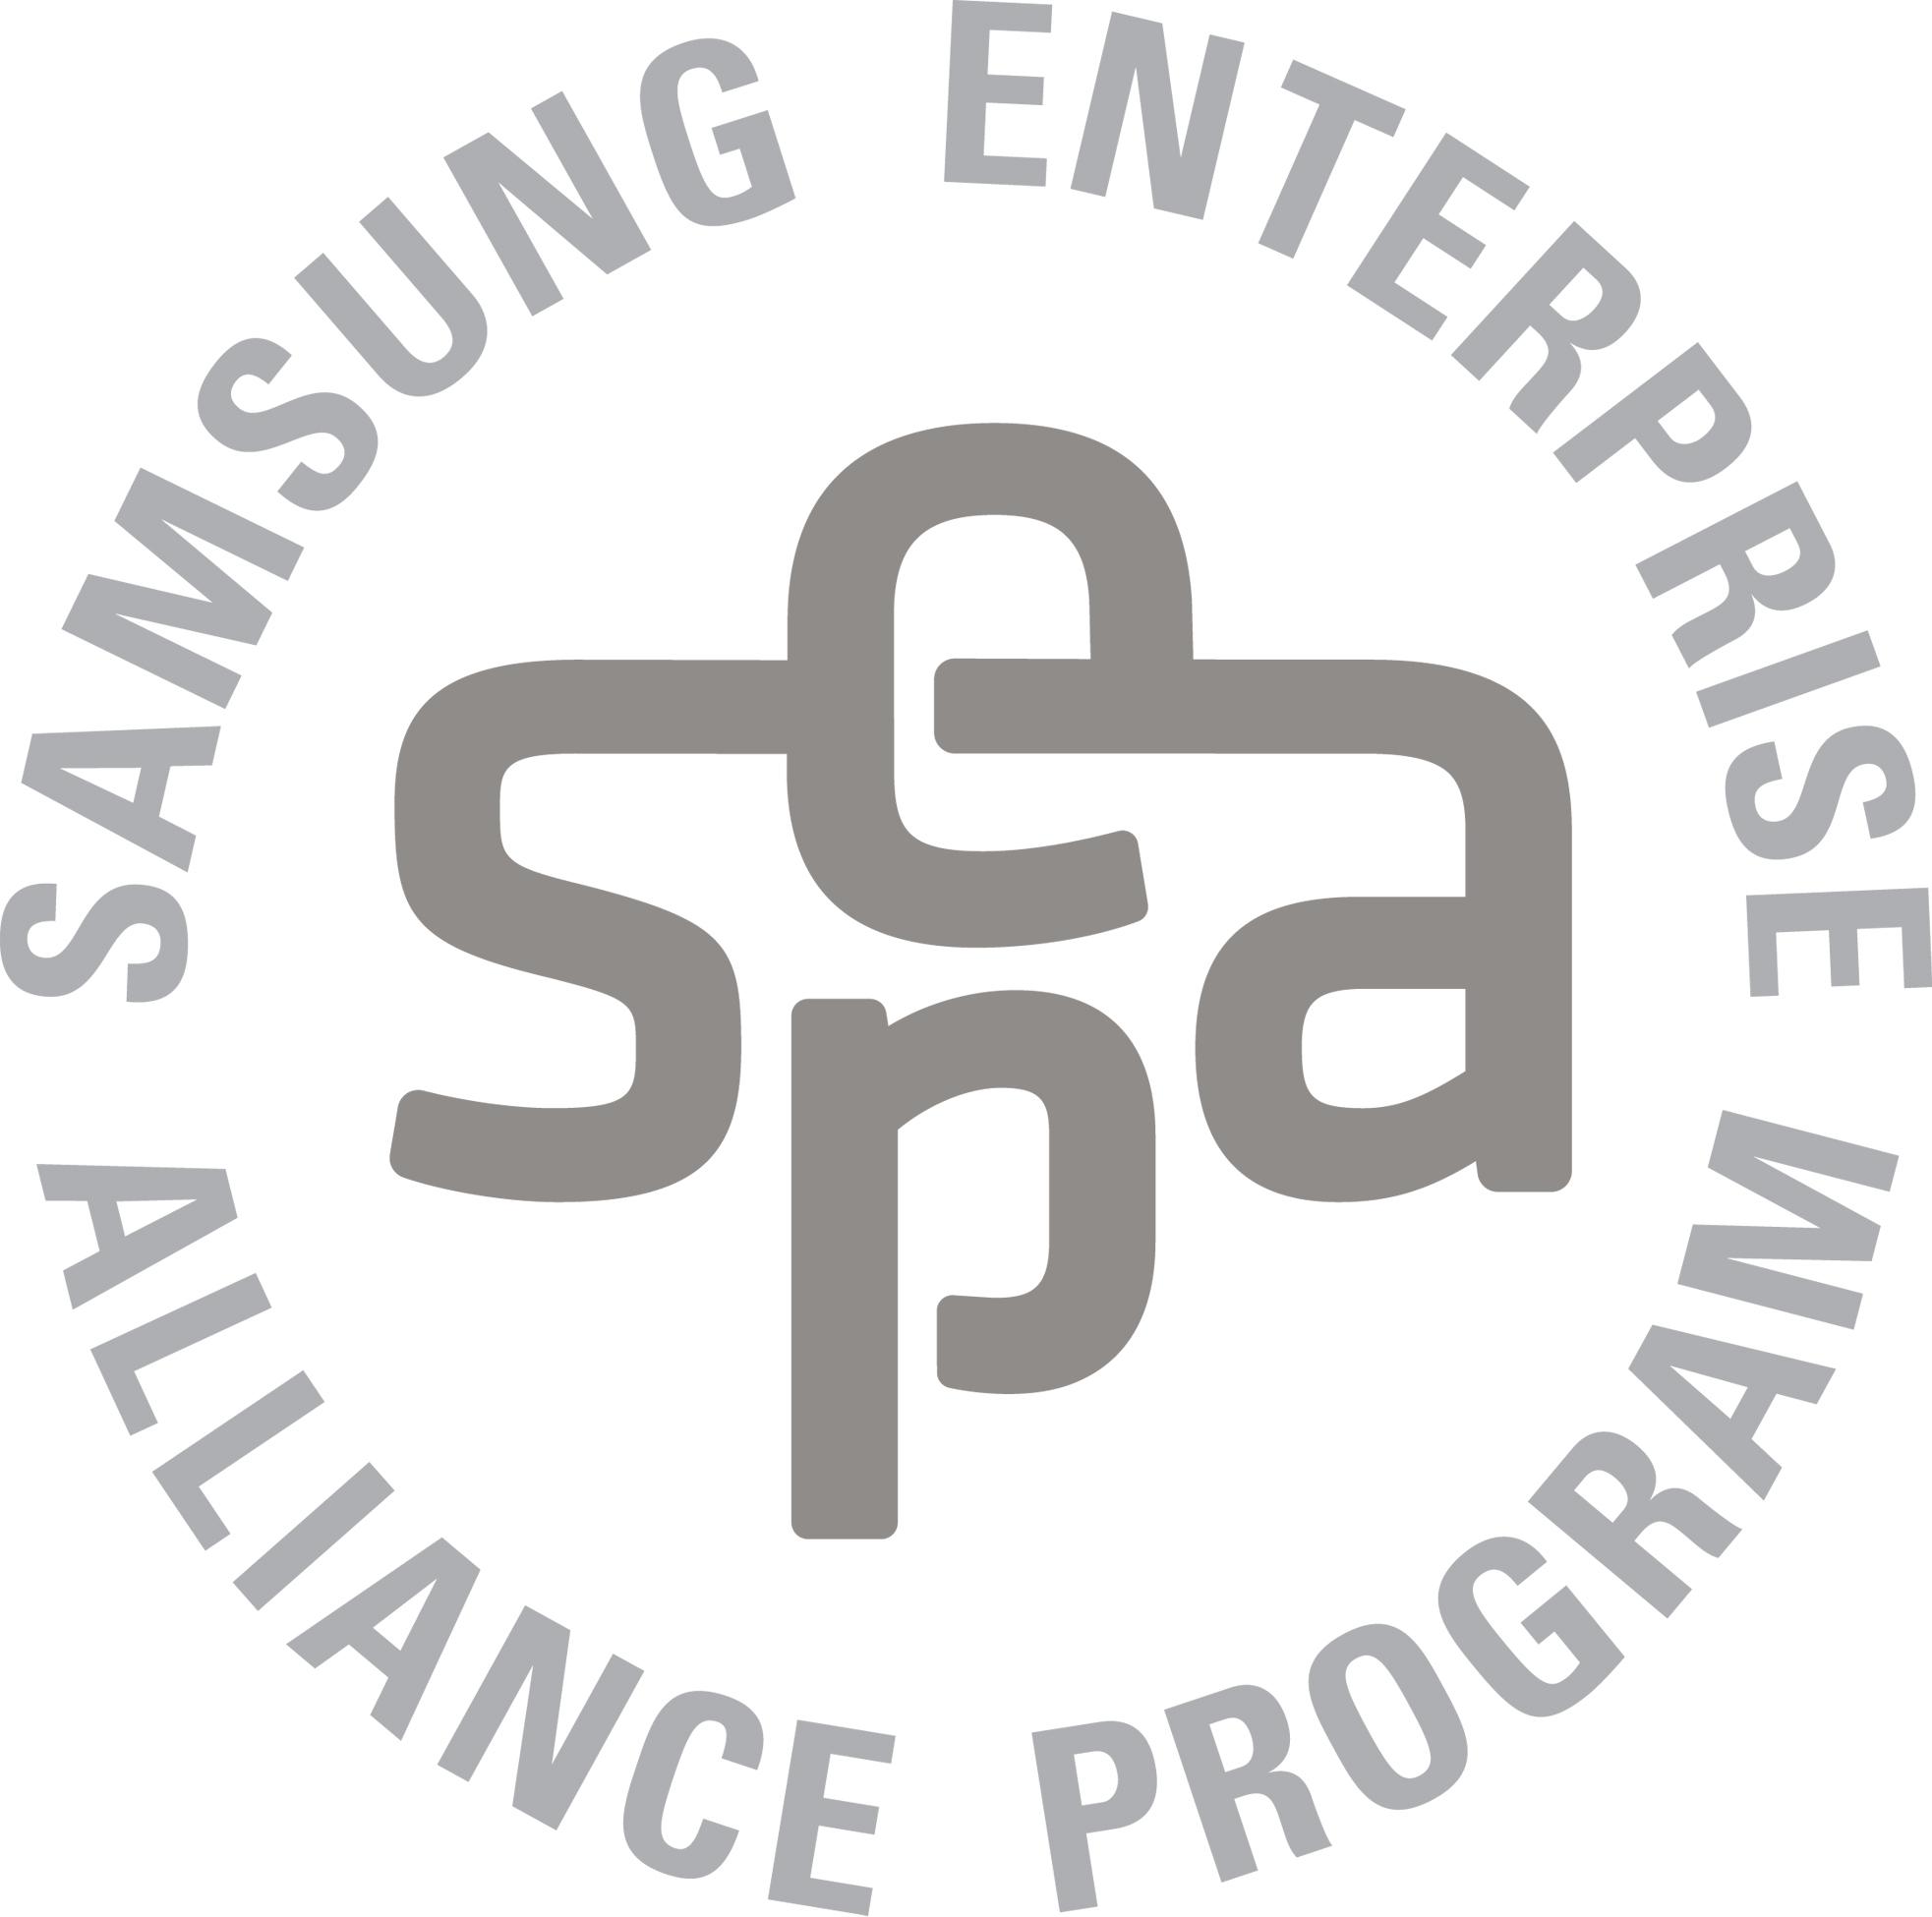 SEAP_Silver Partner EMBLEM